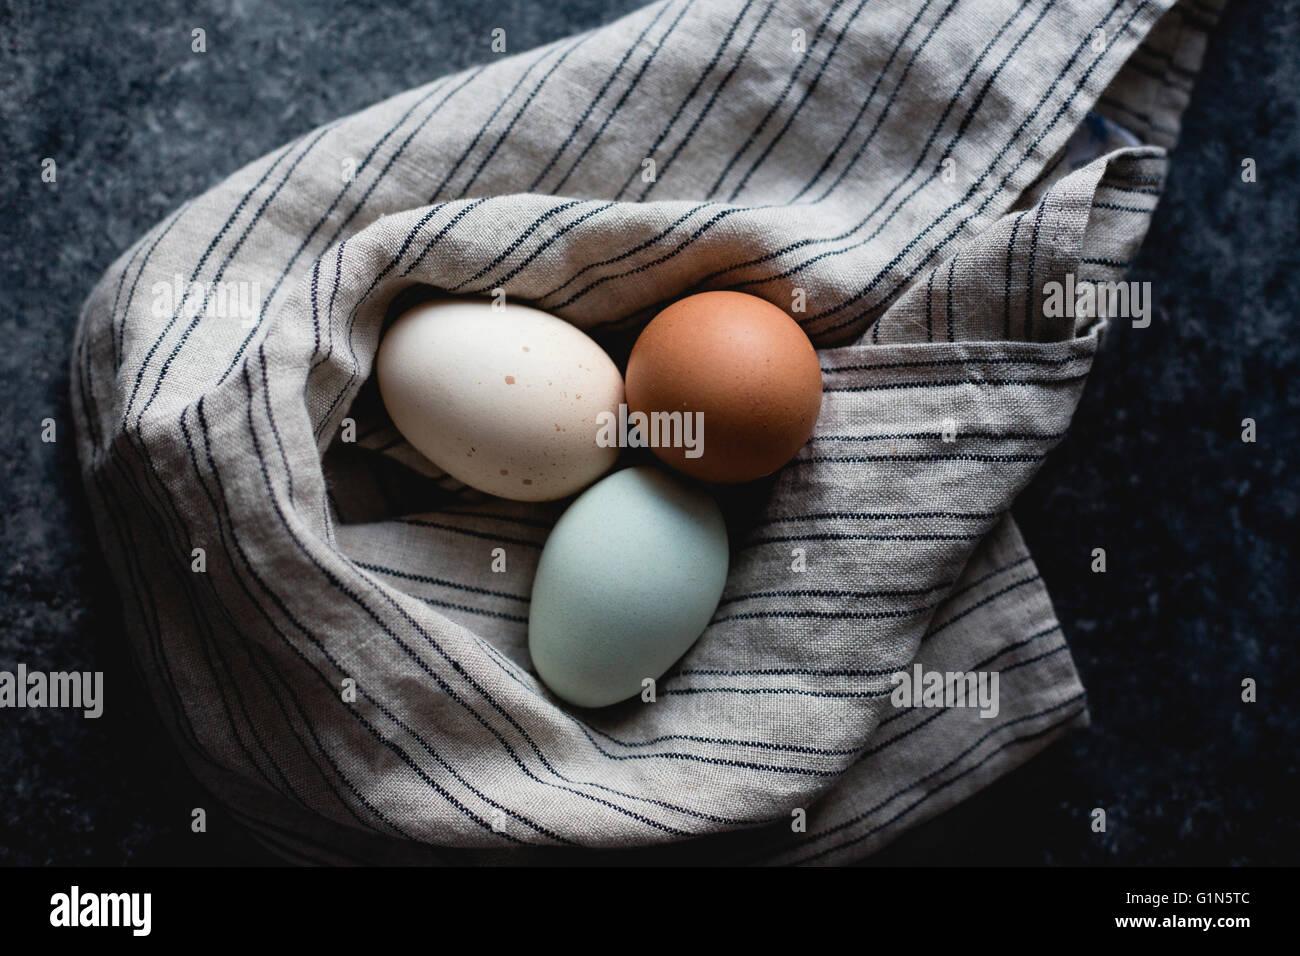 Varie uova colorate Immagini Stock